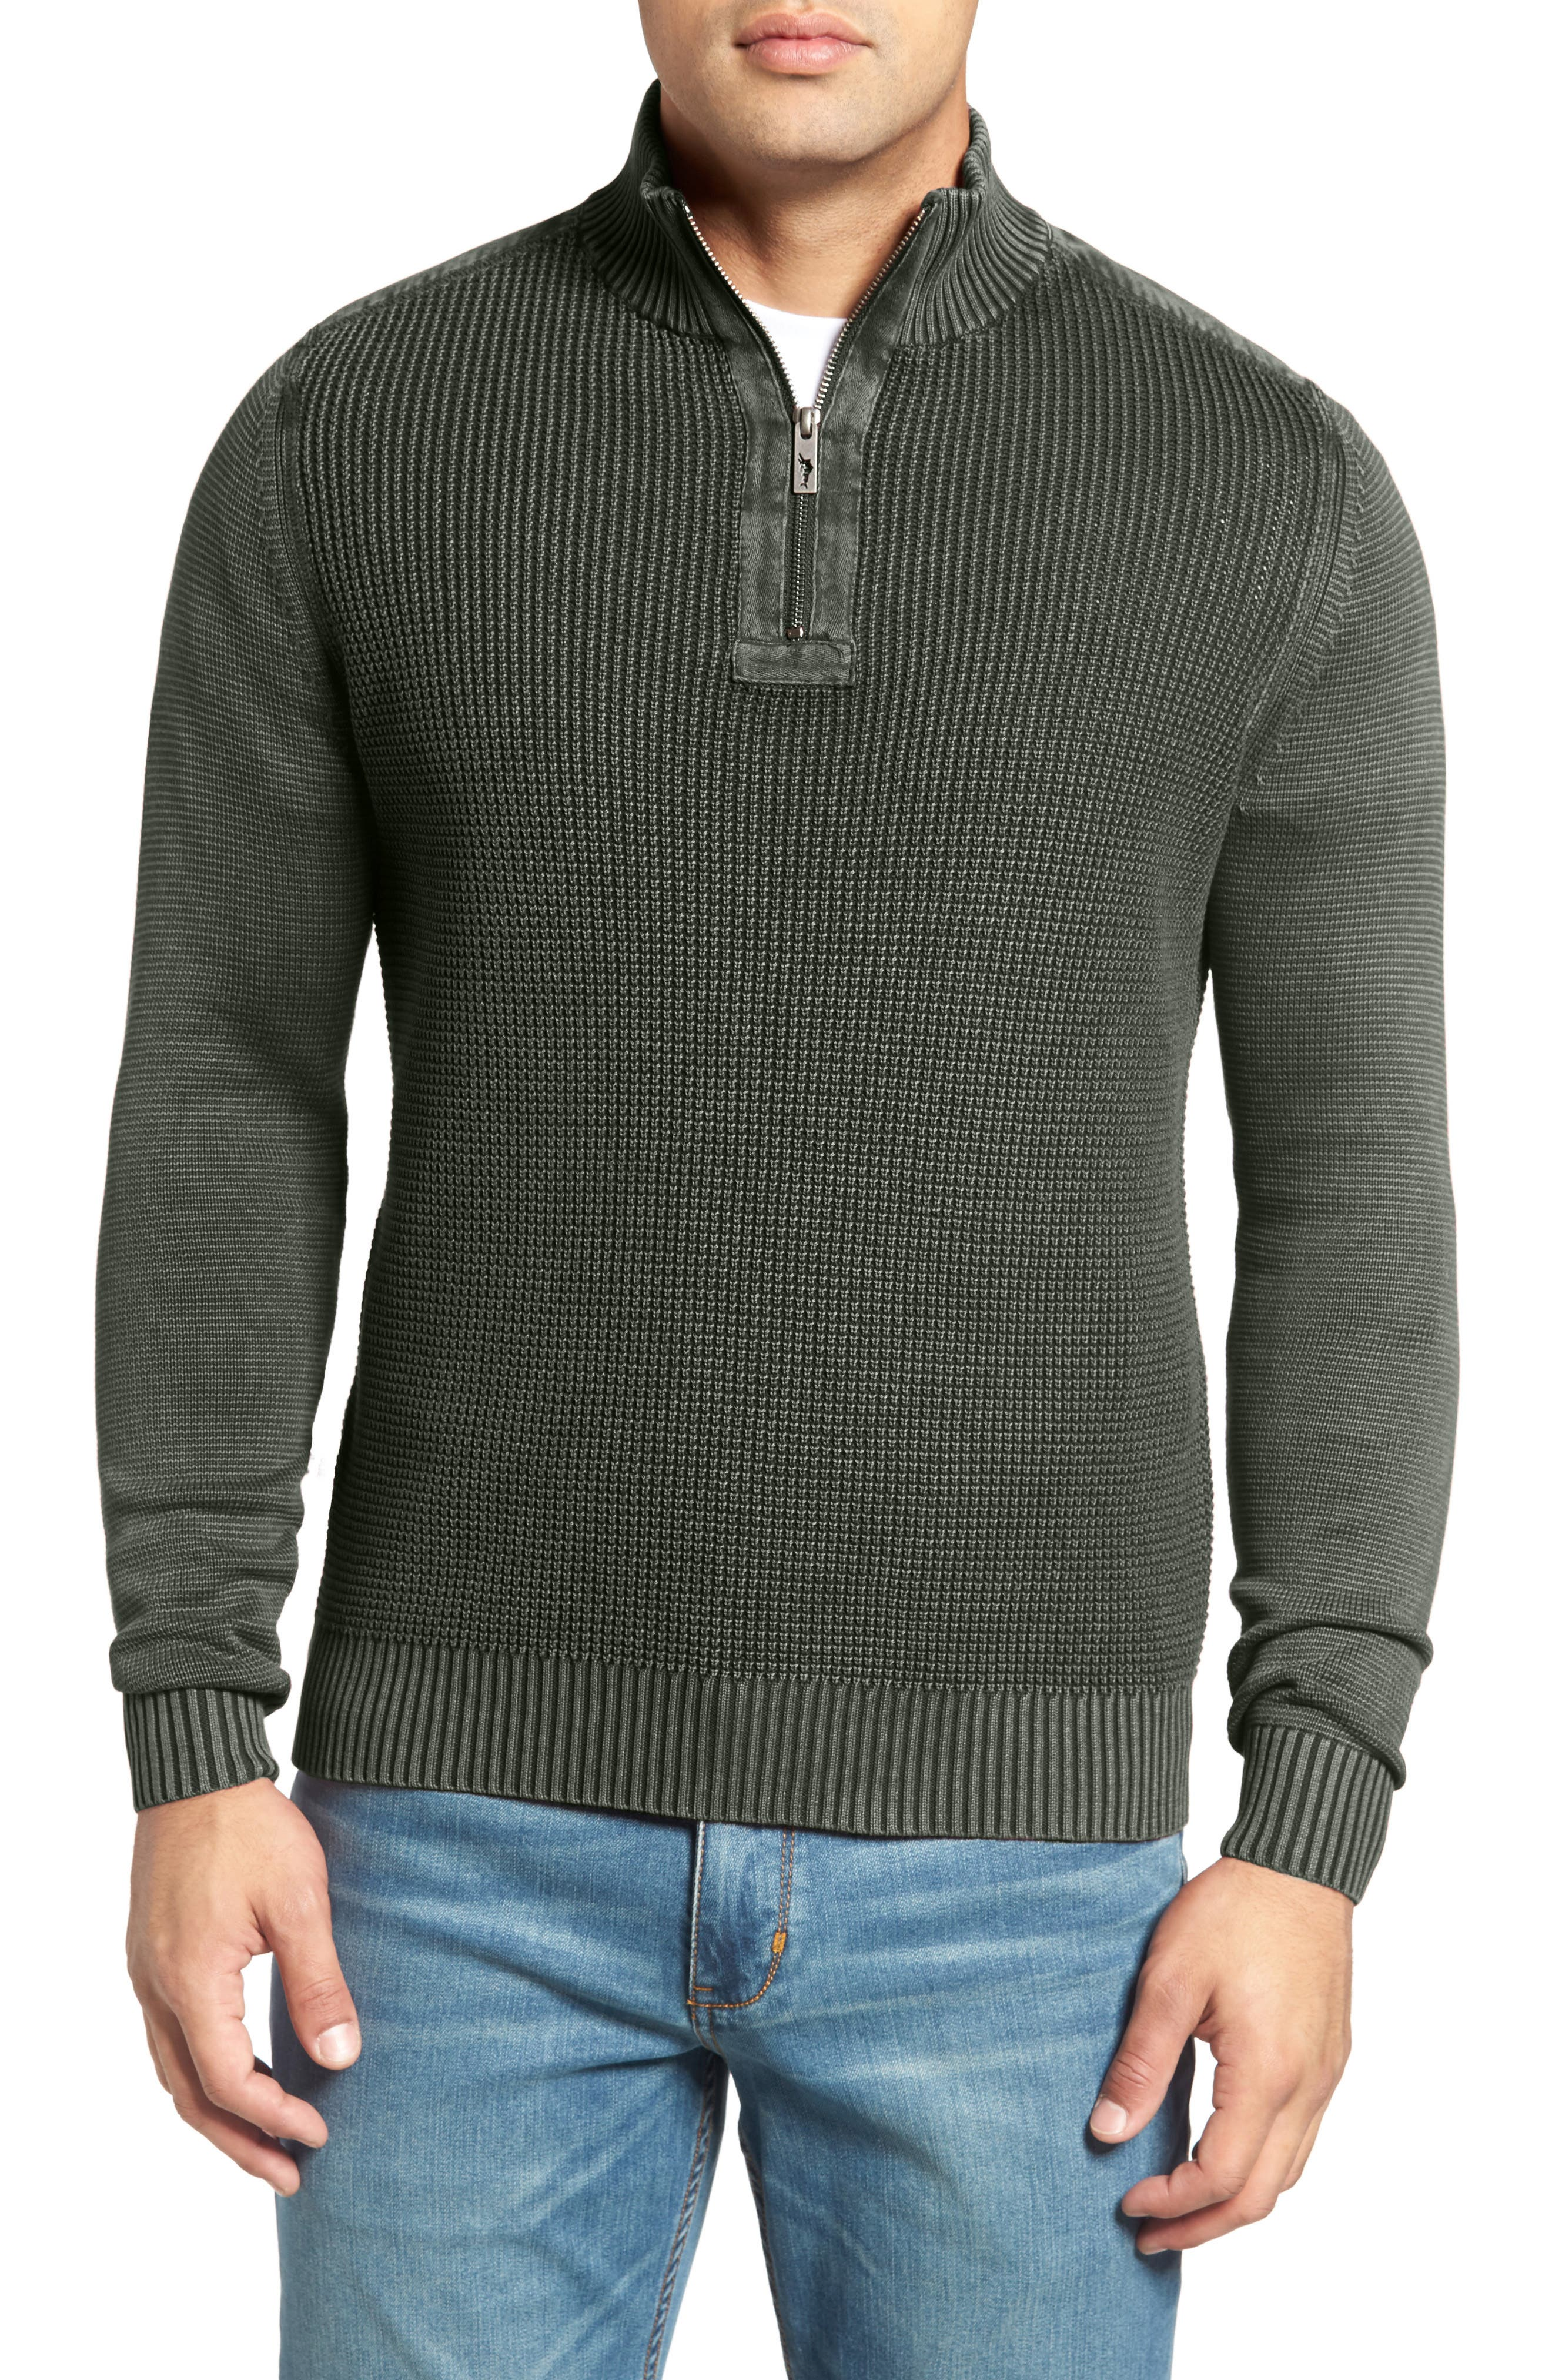 Coastal Shores Quarter Zip Sweater,                             Alternate thumbnail 12, color,